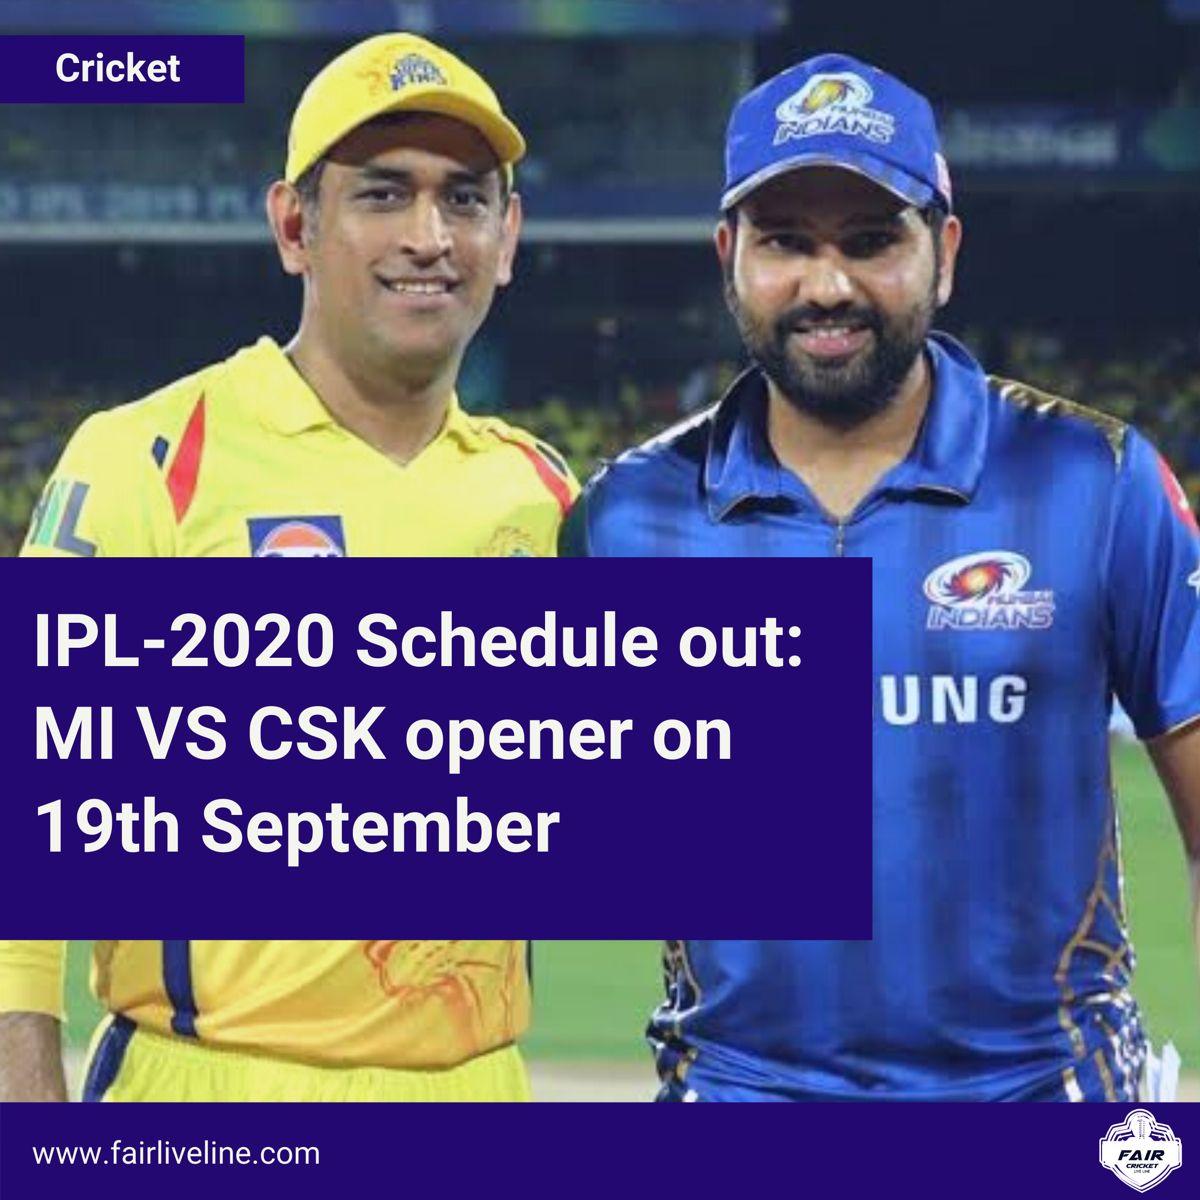 Fair Cricket Live Line Live Cricket Online Cricket Score Latest News In 2020 Ipl Cricket Live Chennai Super Kings Live Cricket Tv